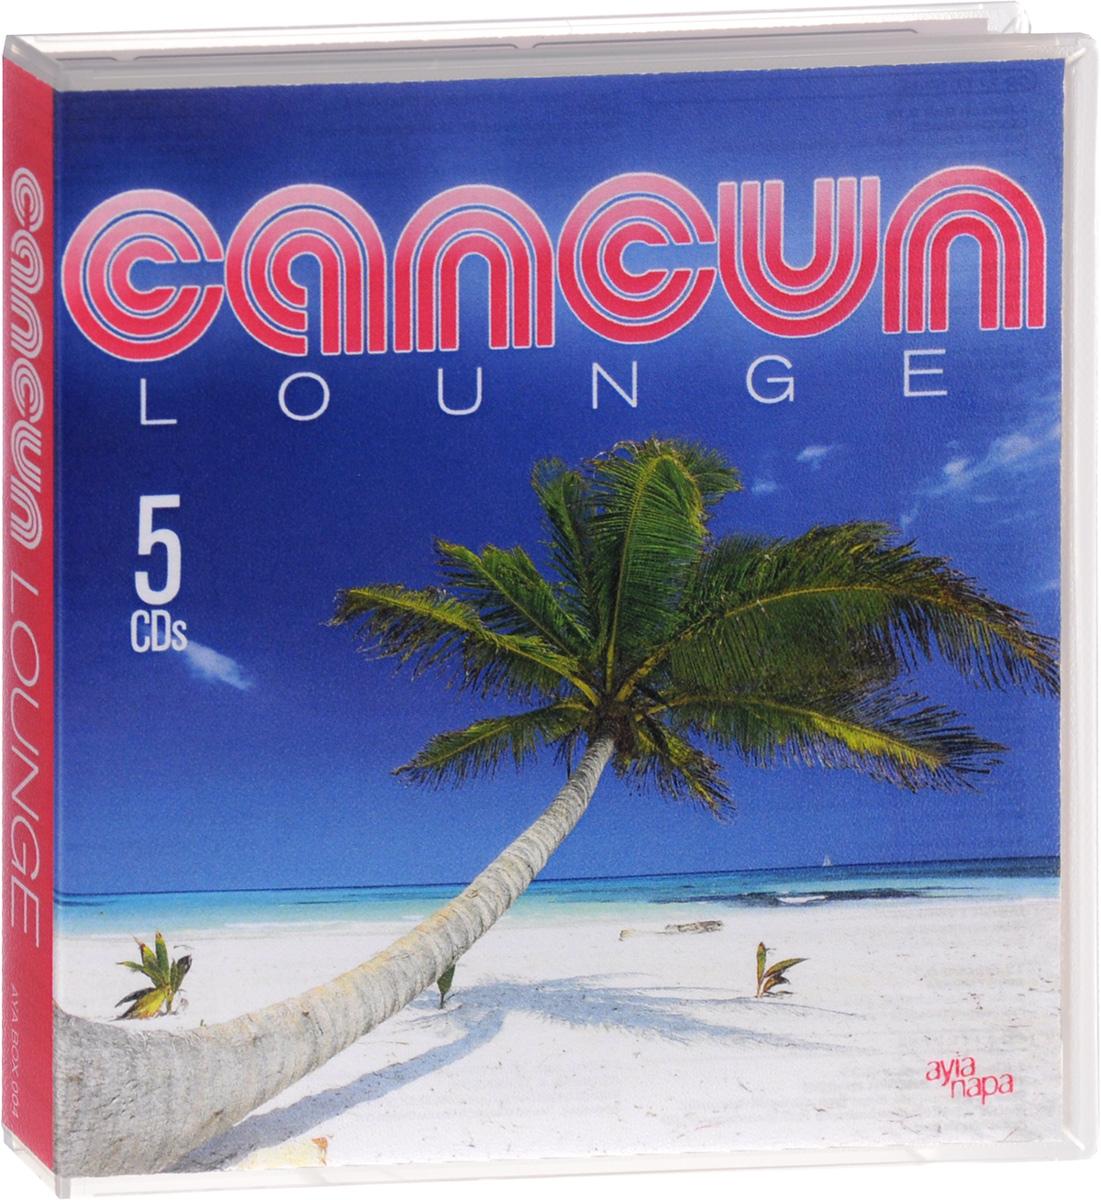 Cancun Lounge (5 CD)